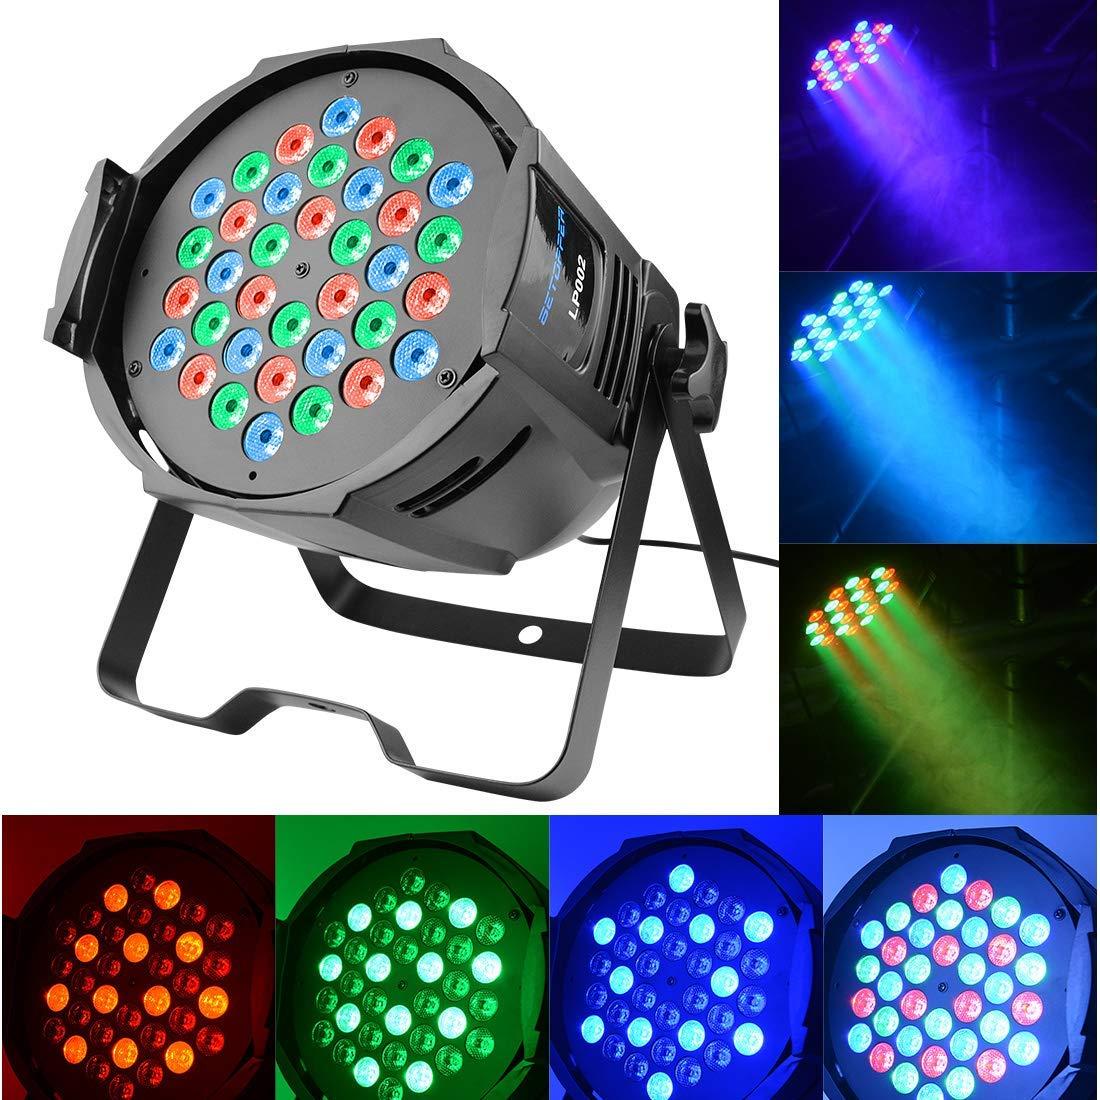 BETOPPER Par LED 36 3W RGB DJ Stage Light Wash Light Professional DMX512 Stage Music Lighting for DJ Disco Party Lights